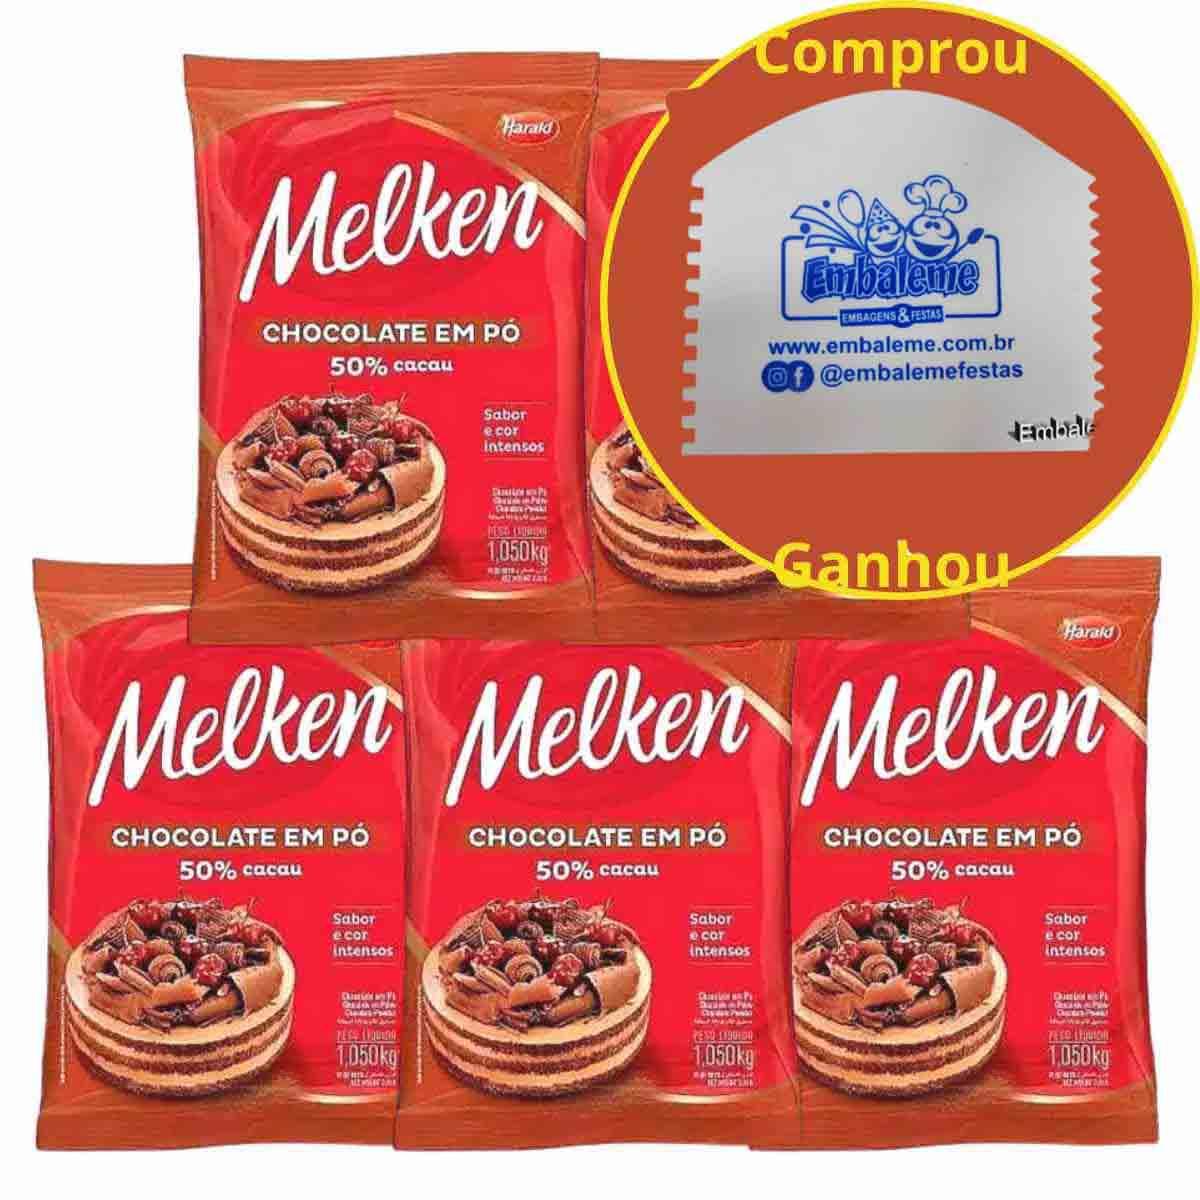 Chocolate em pó 50% cacau Harald Melken 1kg C/5